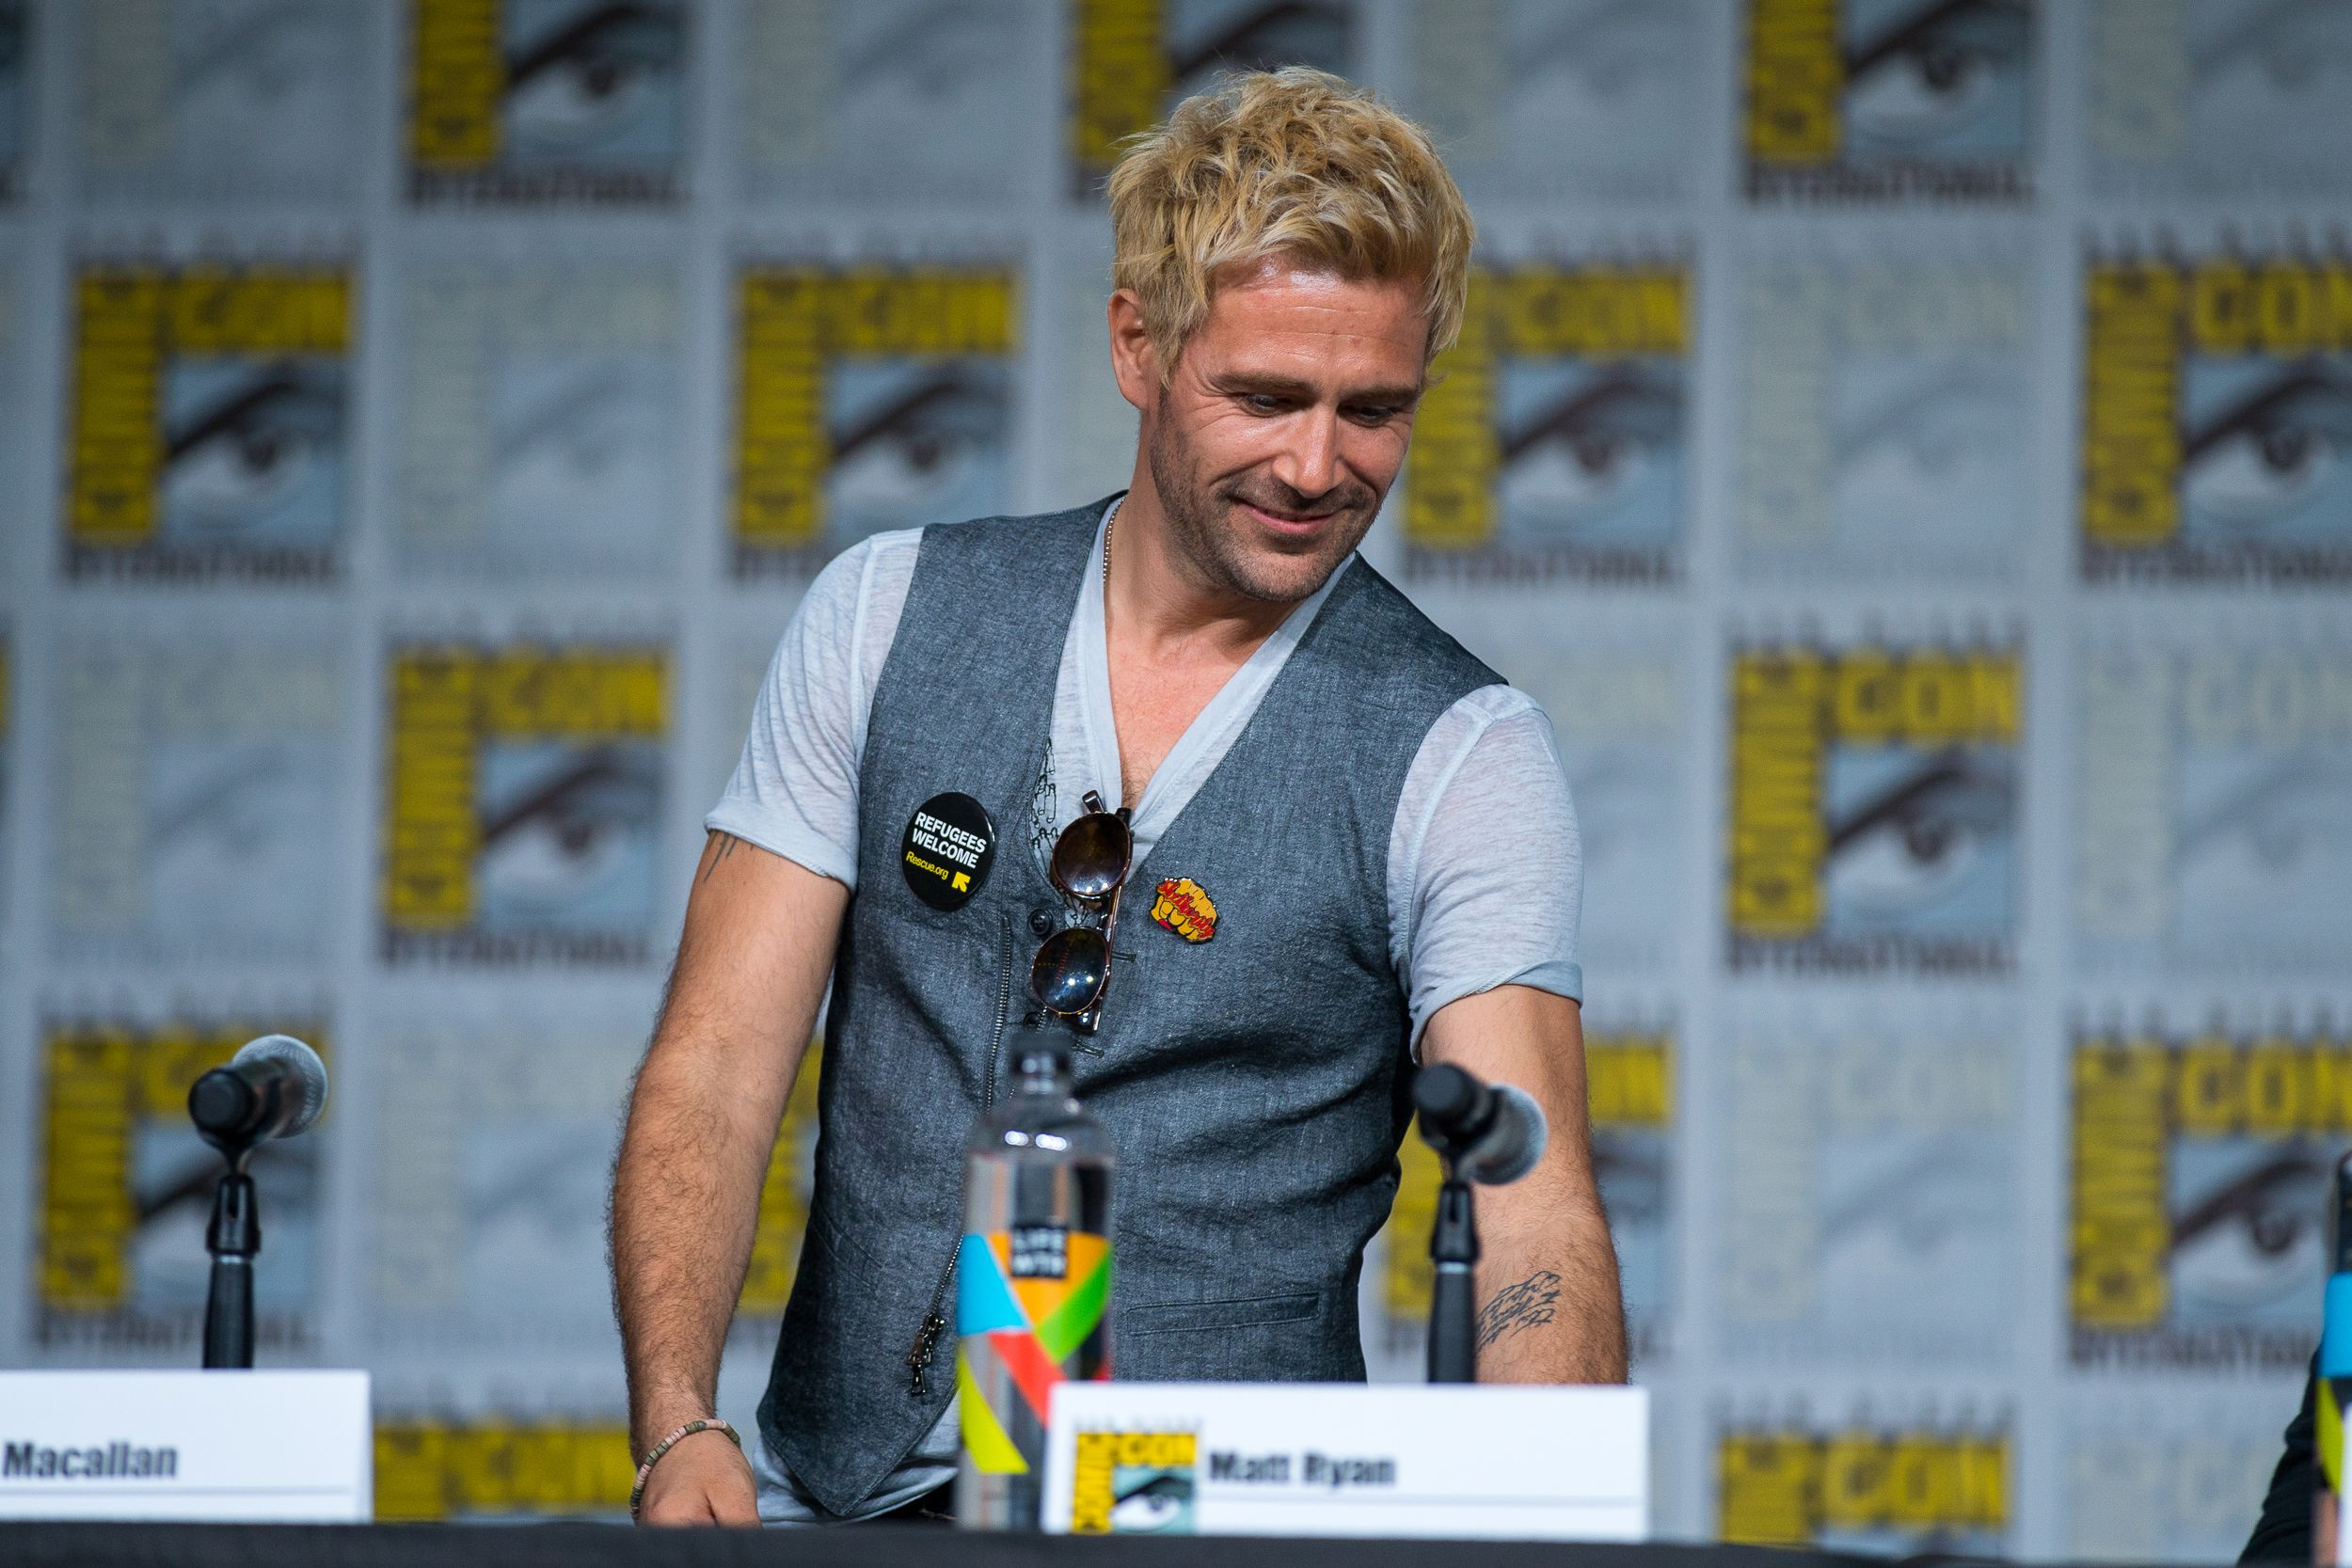 Pin By Tabitha Dearth On Actors In 2020 John Constantine Matt Ryan Actors